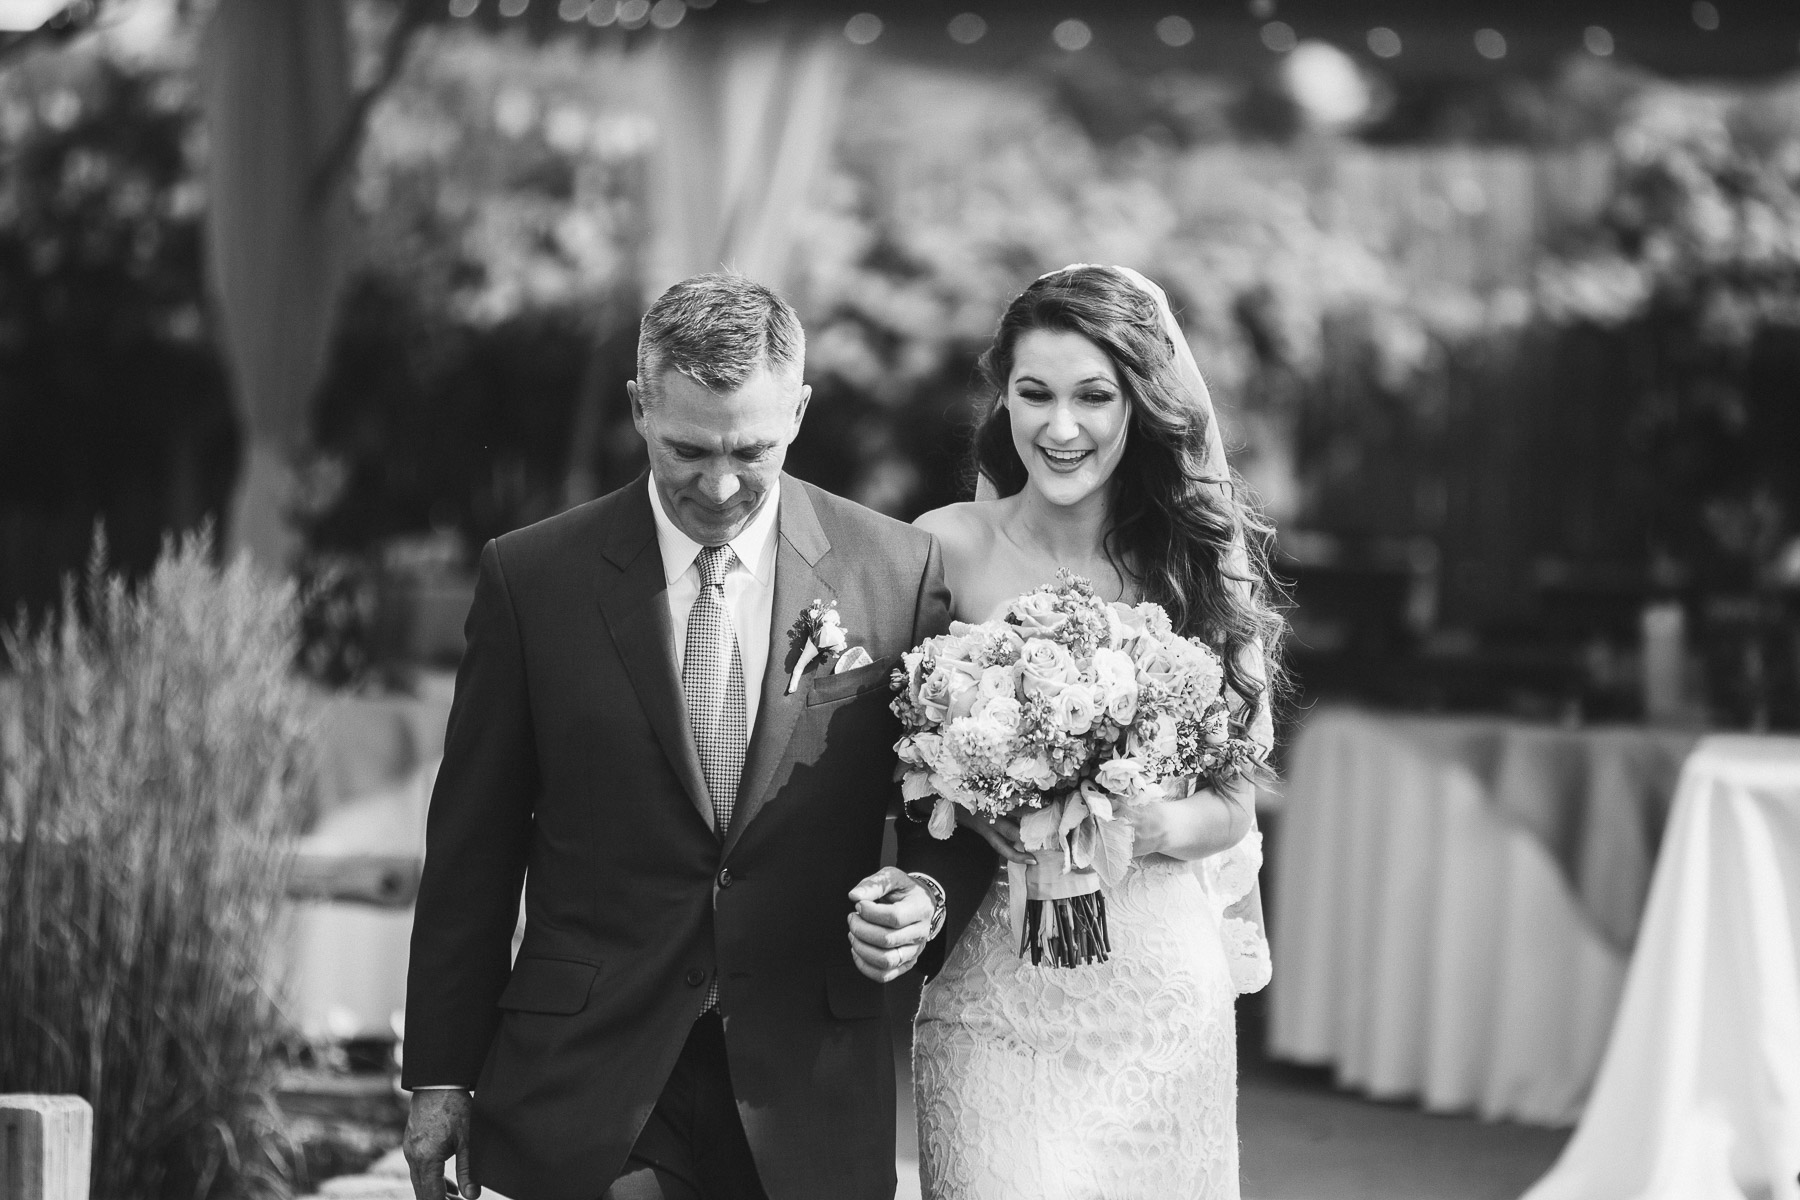 170528-Malkin-Wedding-Sedona-Arizona-Wedding-Photography-Sky-Ranch-Lodge-1019.jpg